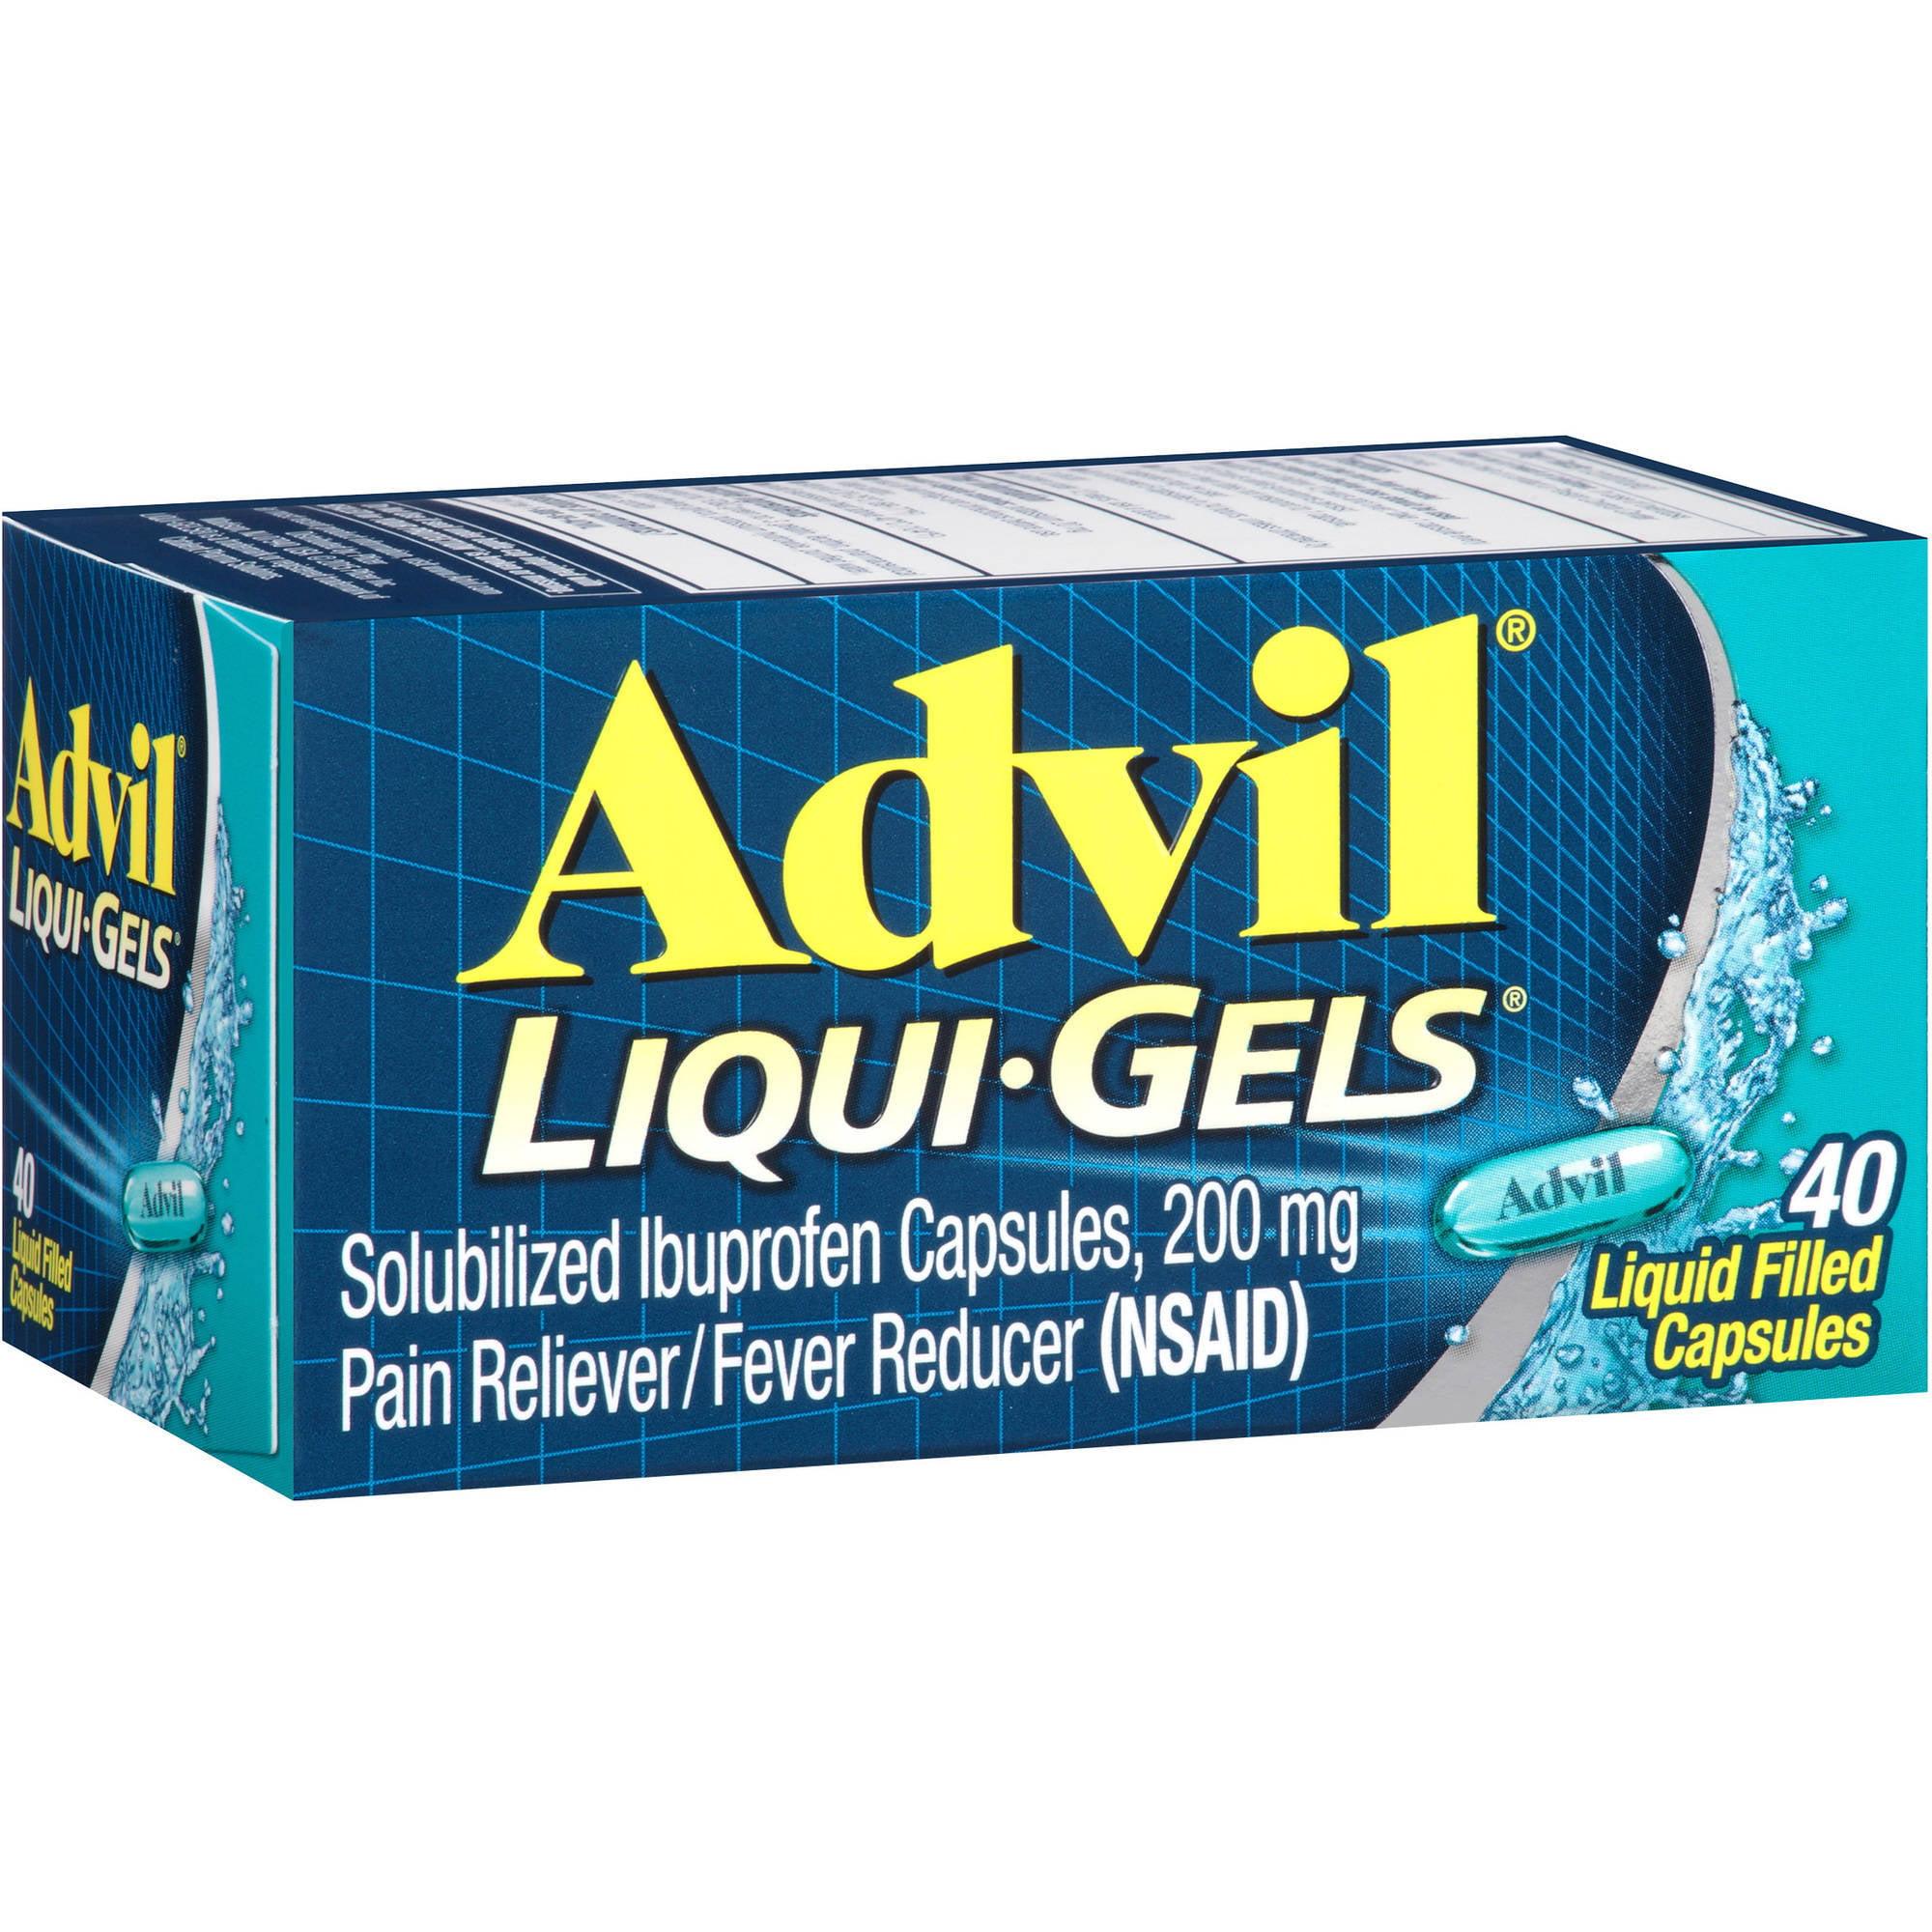 Advil Liqui-Gels, 40 CT (Pack of 6)